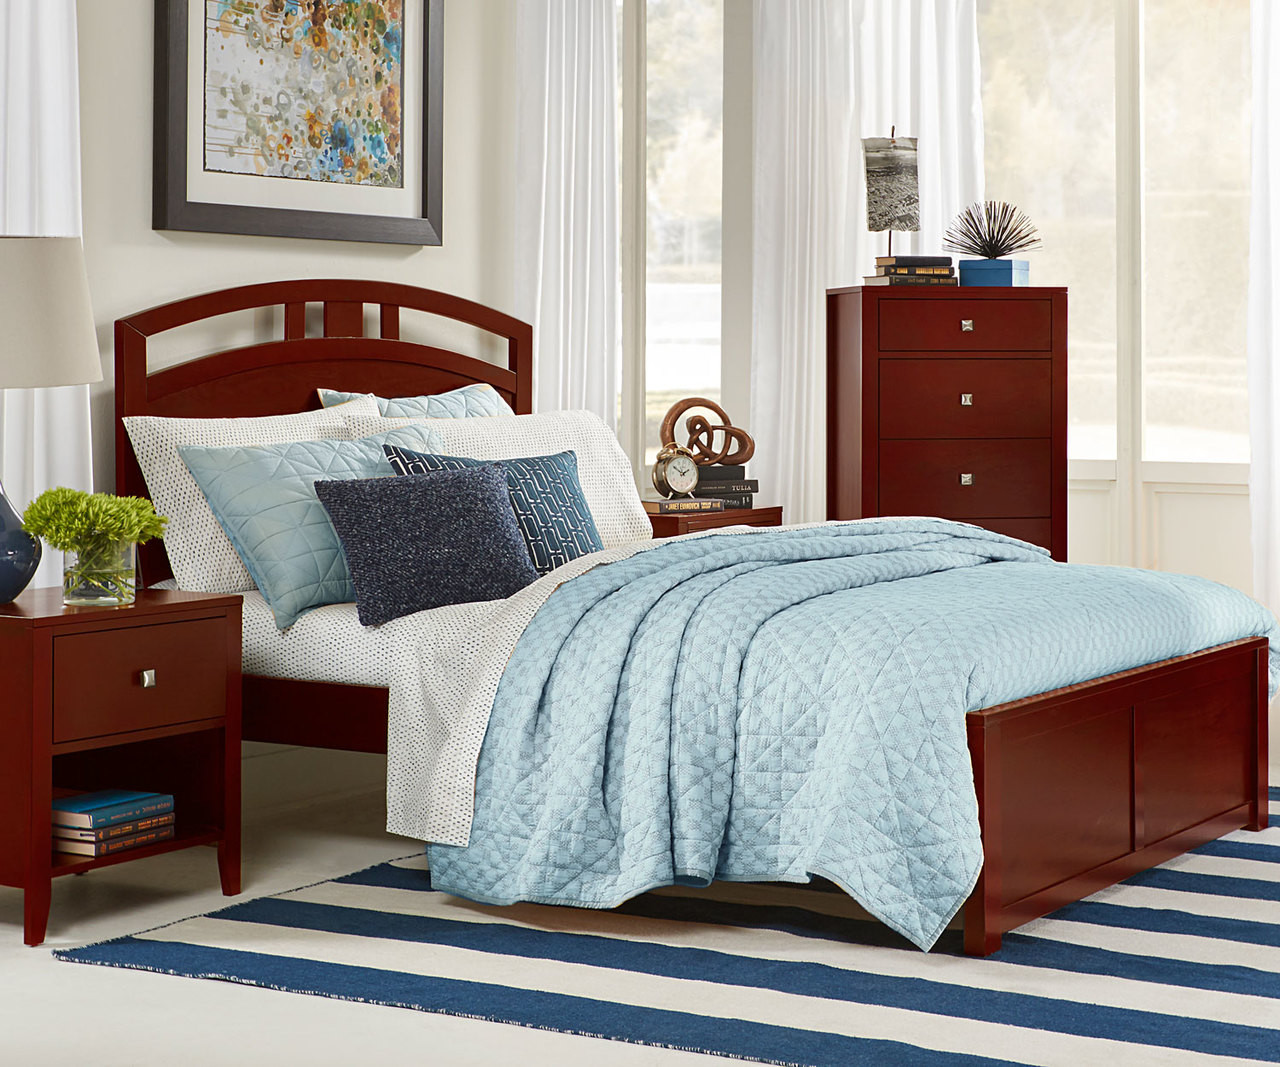 Urbana Cherry Finish Full Size Arch Bed 31022N | NE Kids Furniture ...